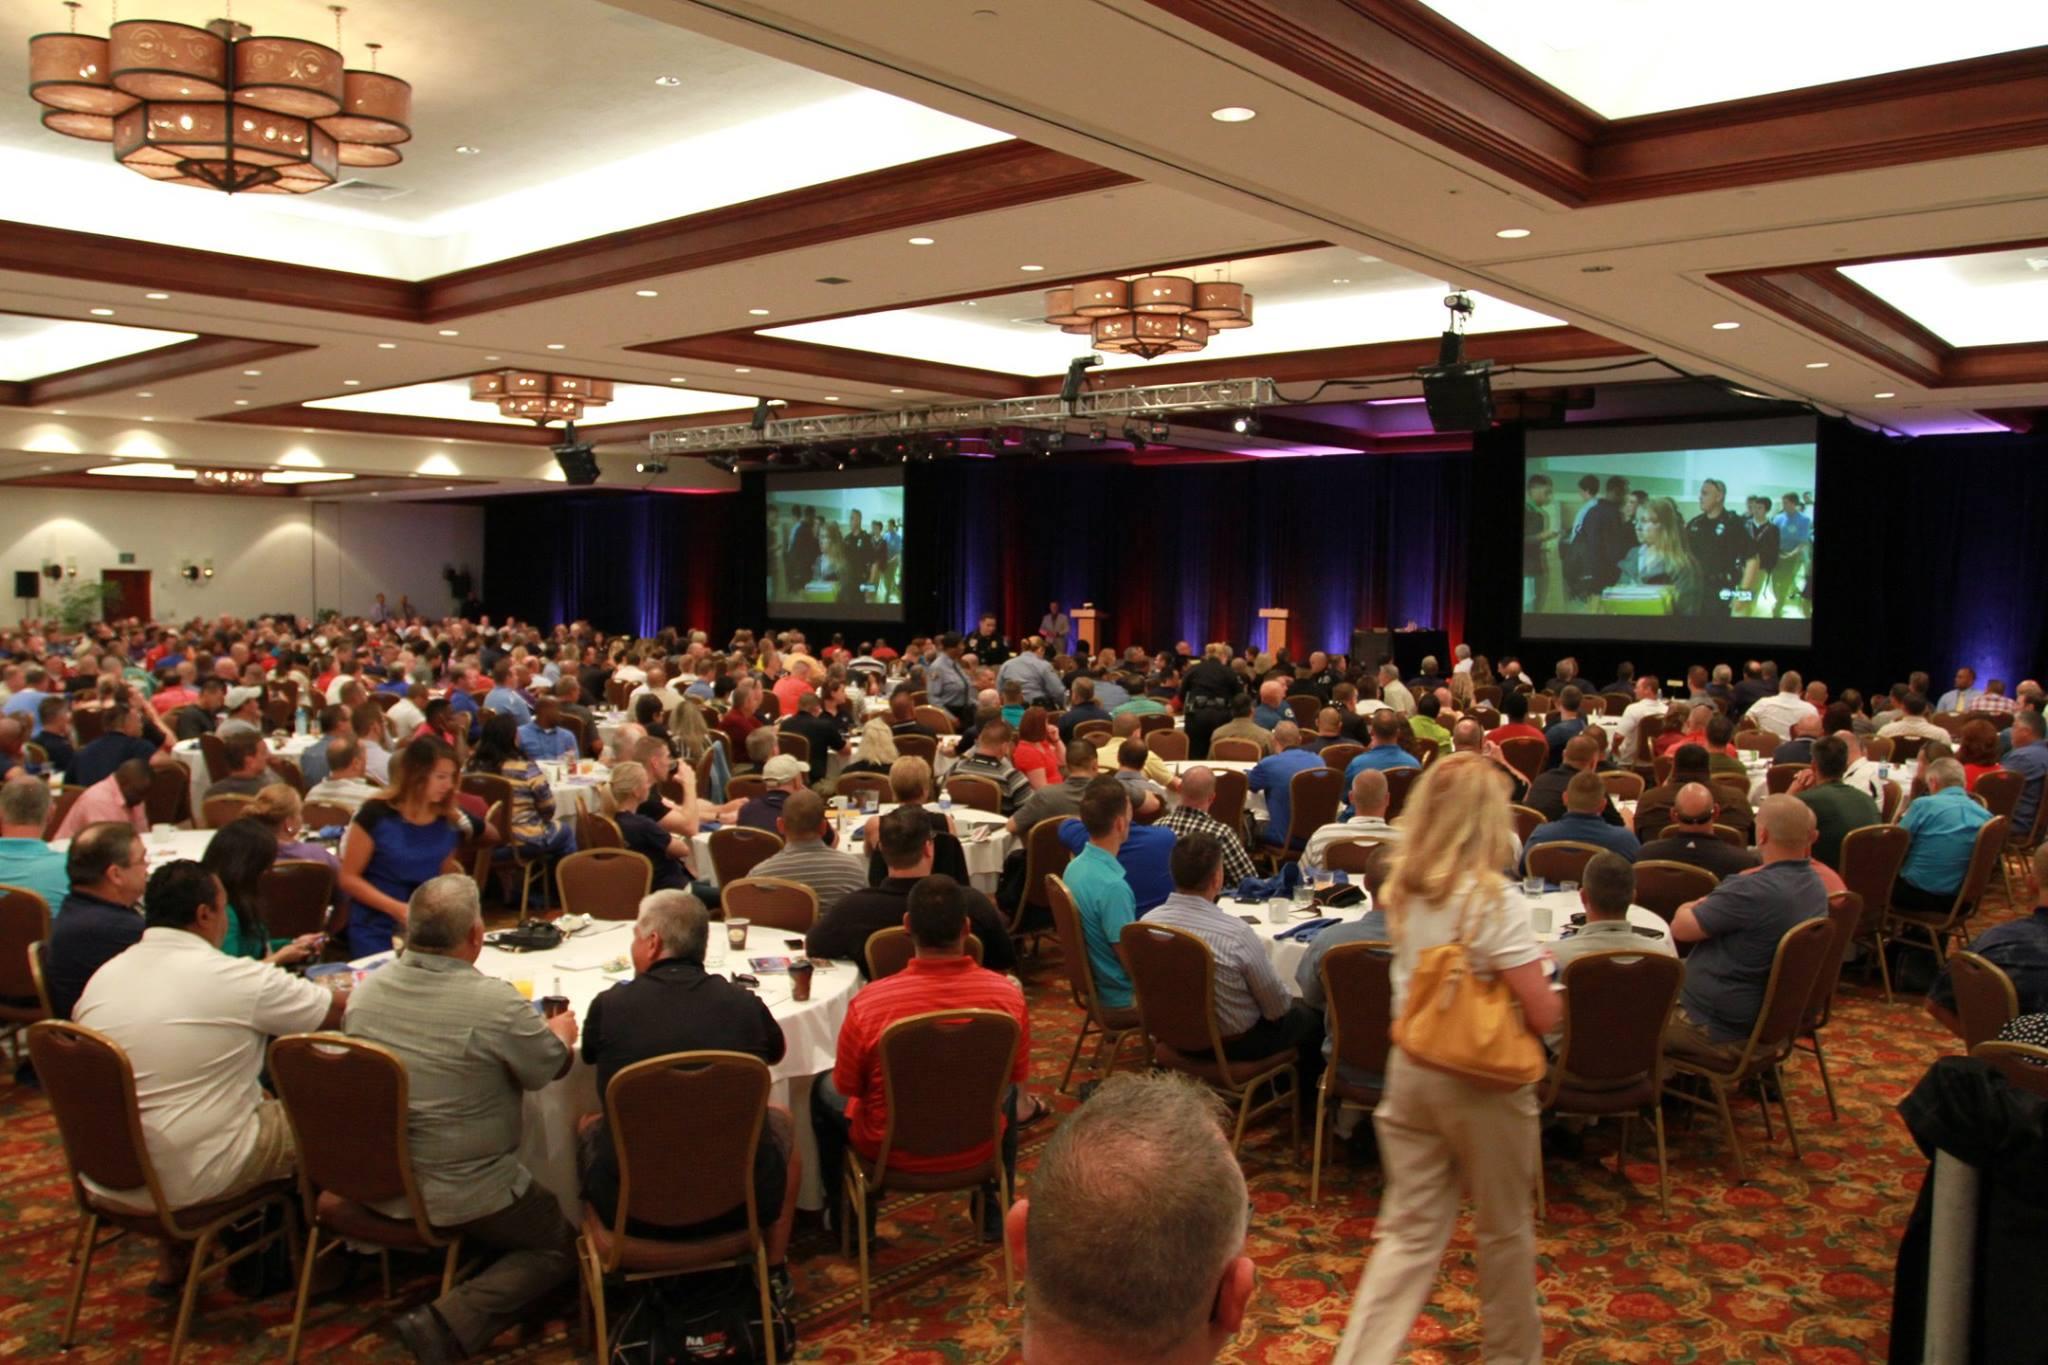 National Association of School Resource Officers Meet in California